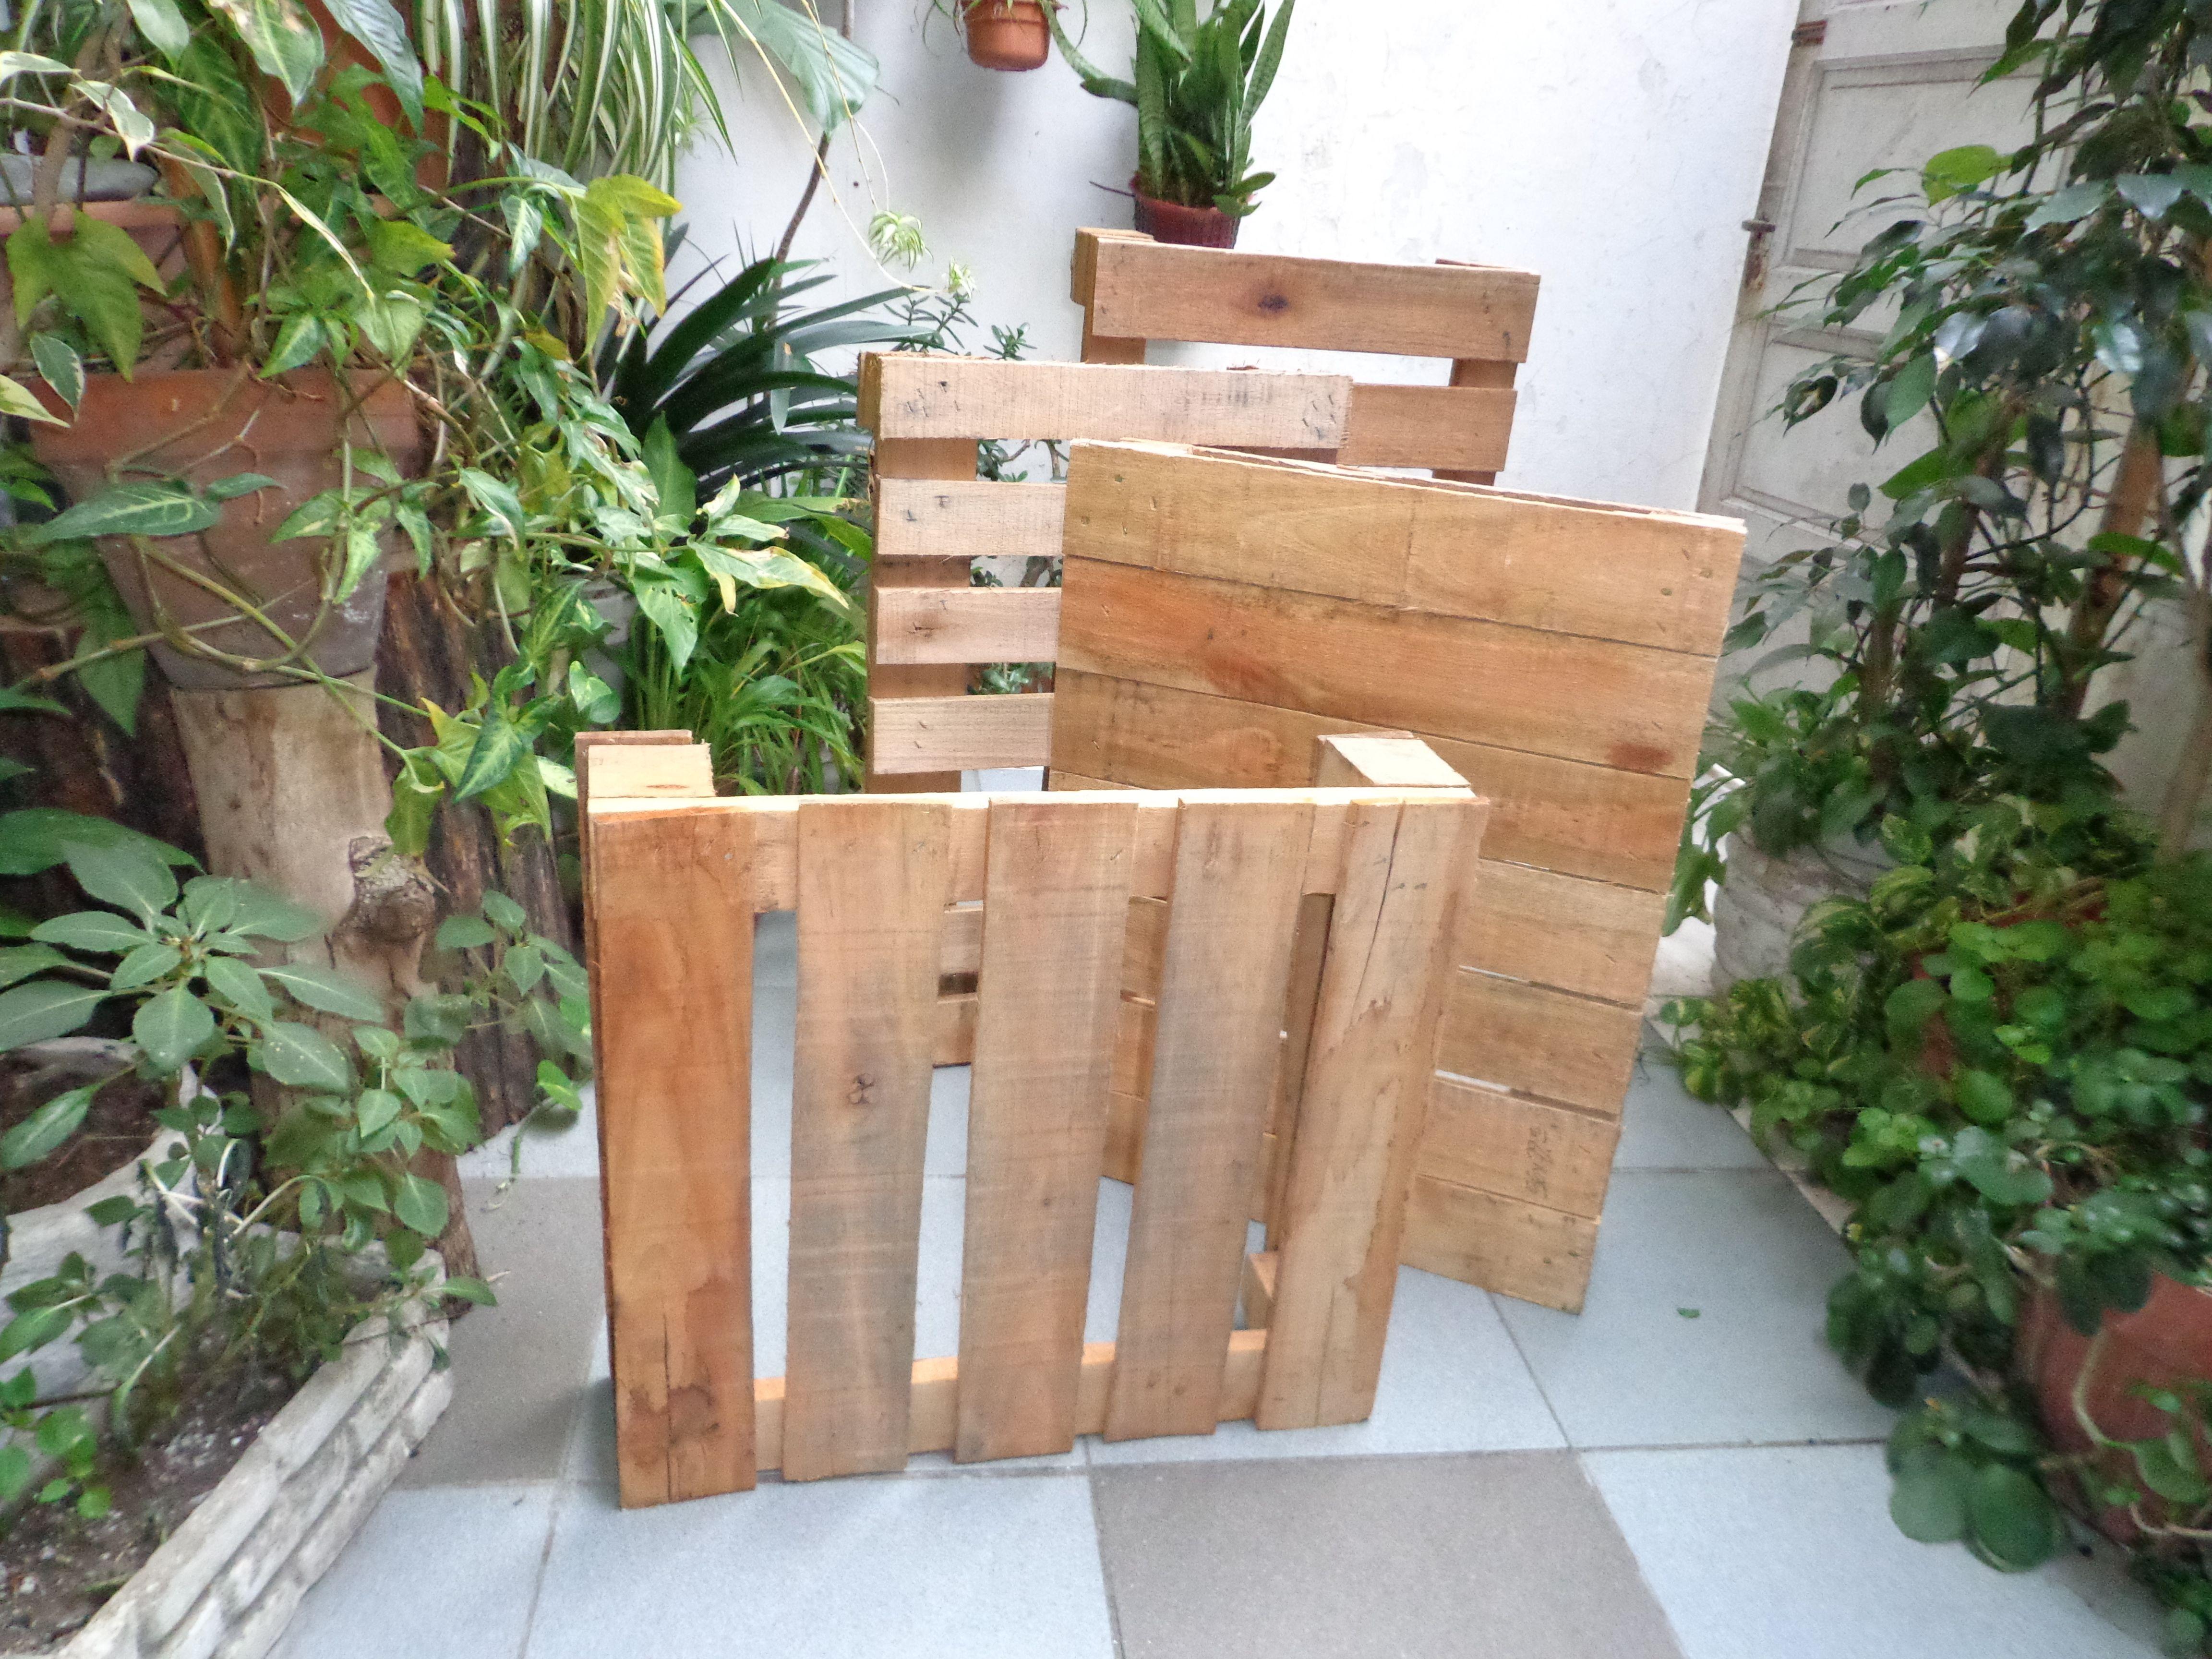 Pallet Excelente Madera Para Mesa Ratona Muebles Huertas  # Muebles La Huerta